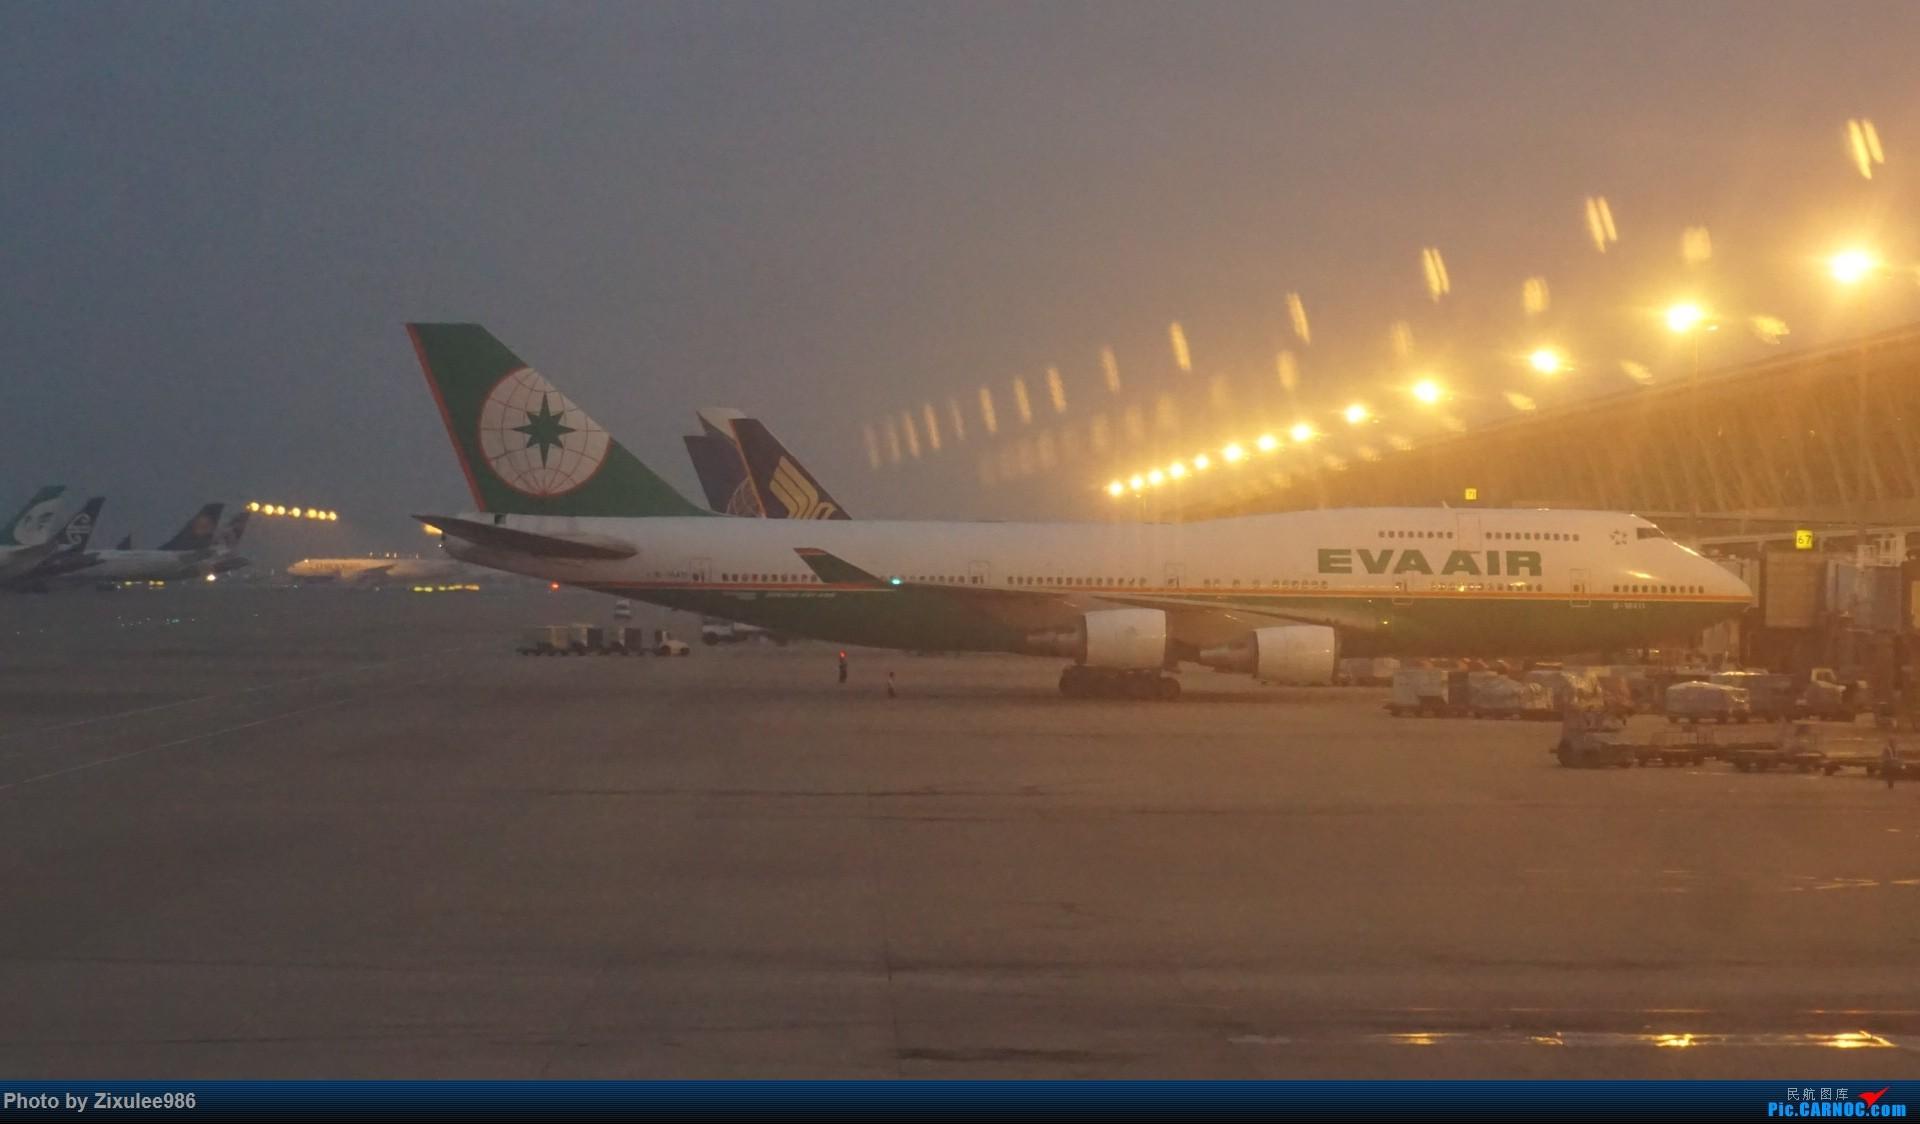 Re:[原创]加拿大21日游学之旅 (二)~加航AC28..PVG-YYZ到达多村后的雨天~多图缓更,请各位大侠谅解~ BOEING 747-400 B-16411 中国上海浦东国际机场